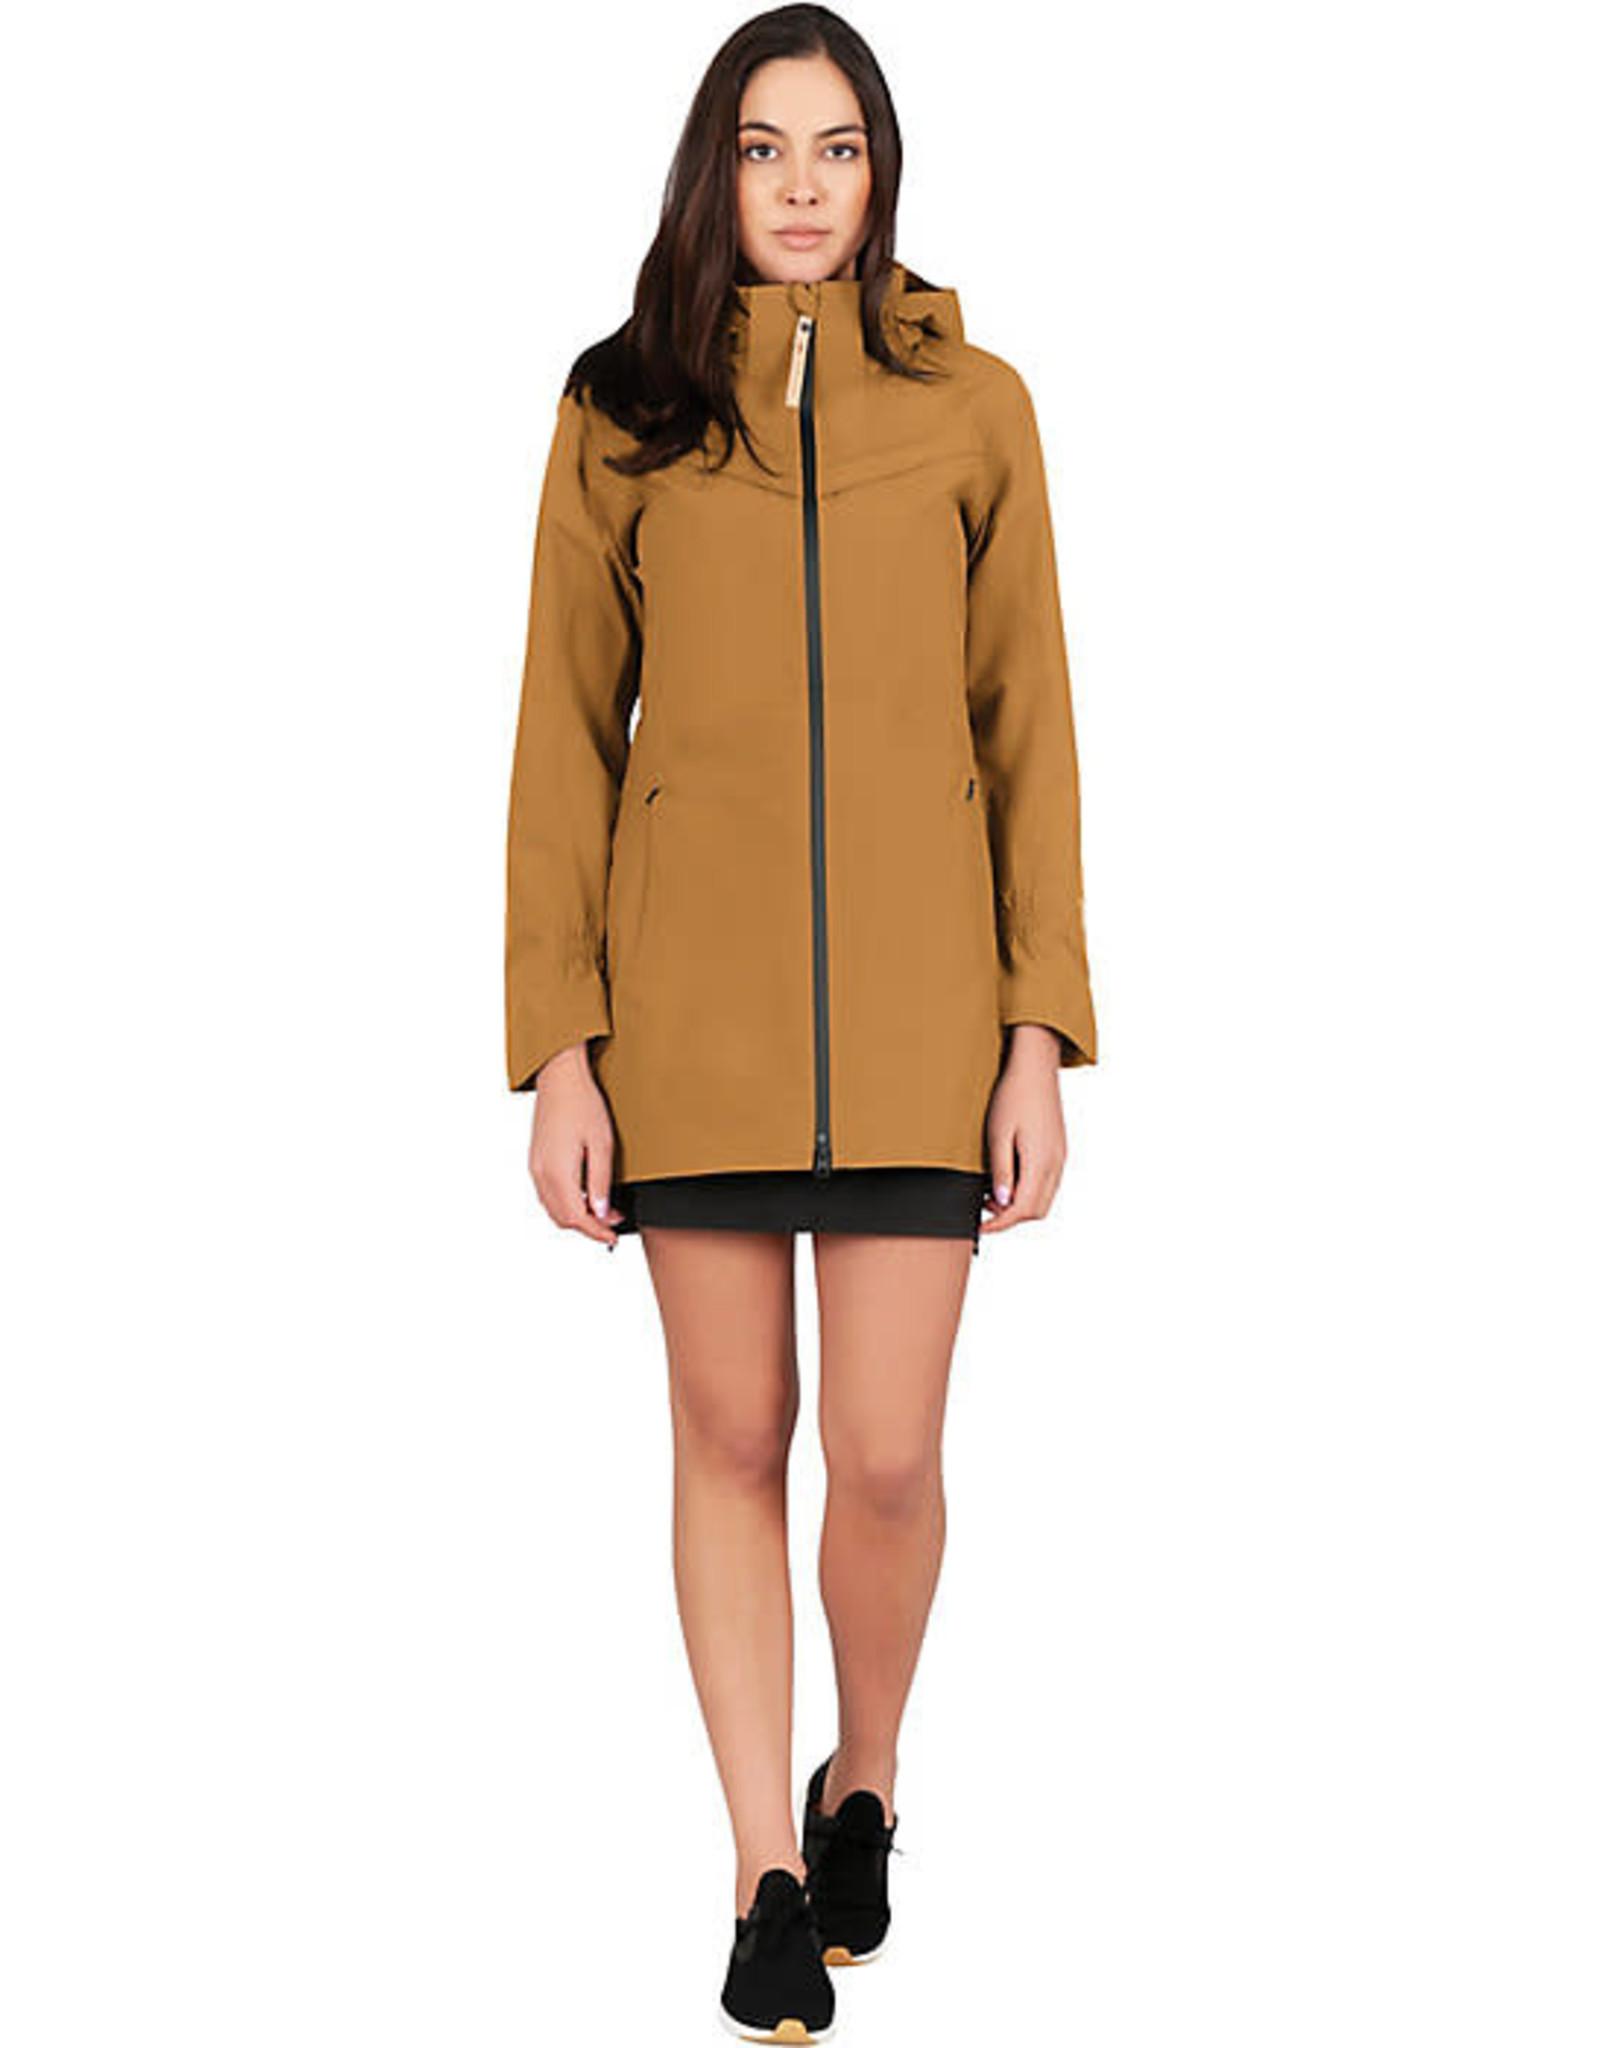 Indygena Kisa jacket